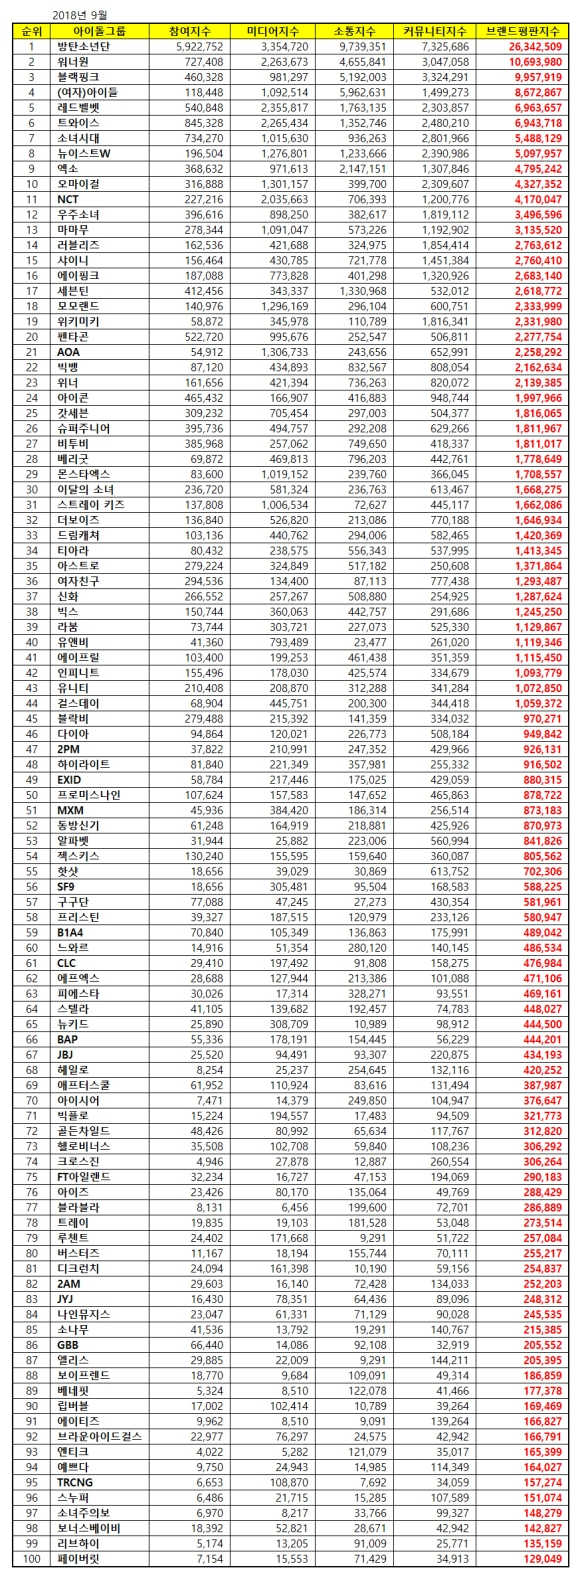 180929 sept 2018 brand index reputation idol group list